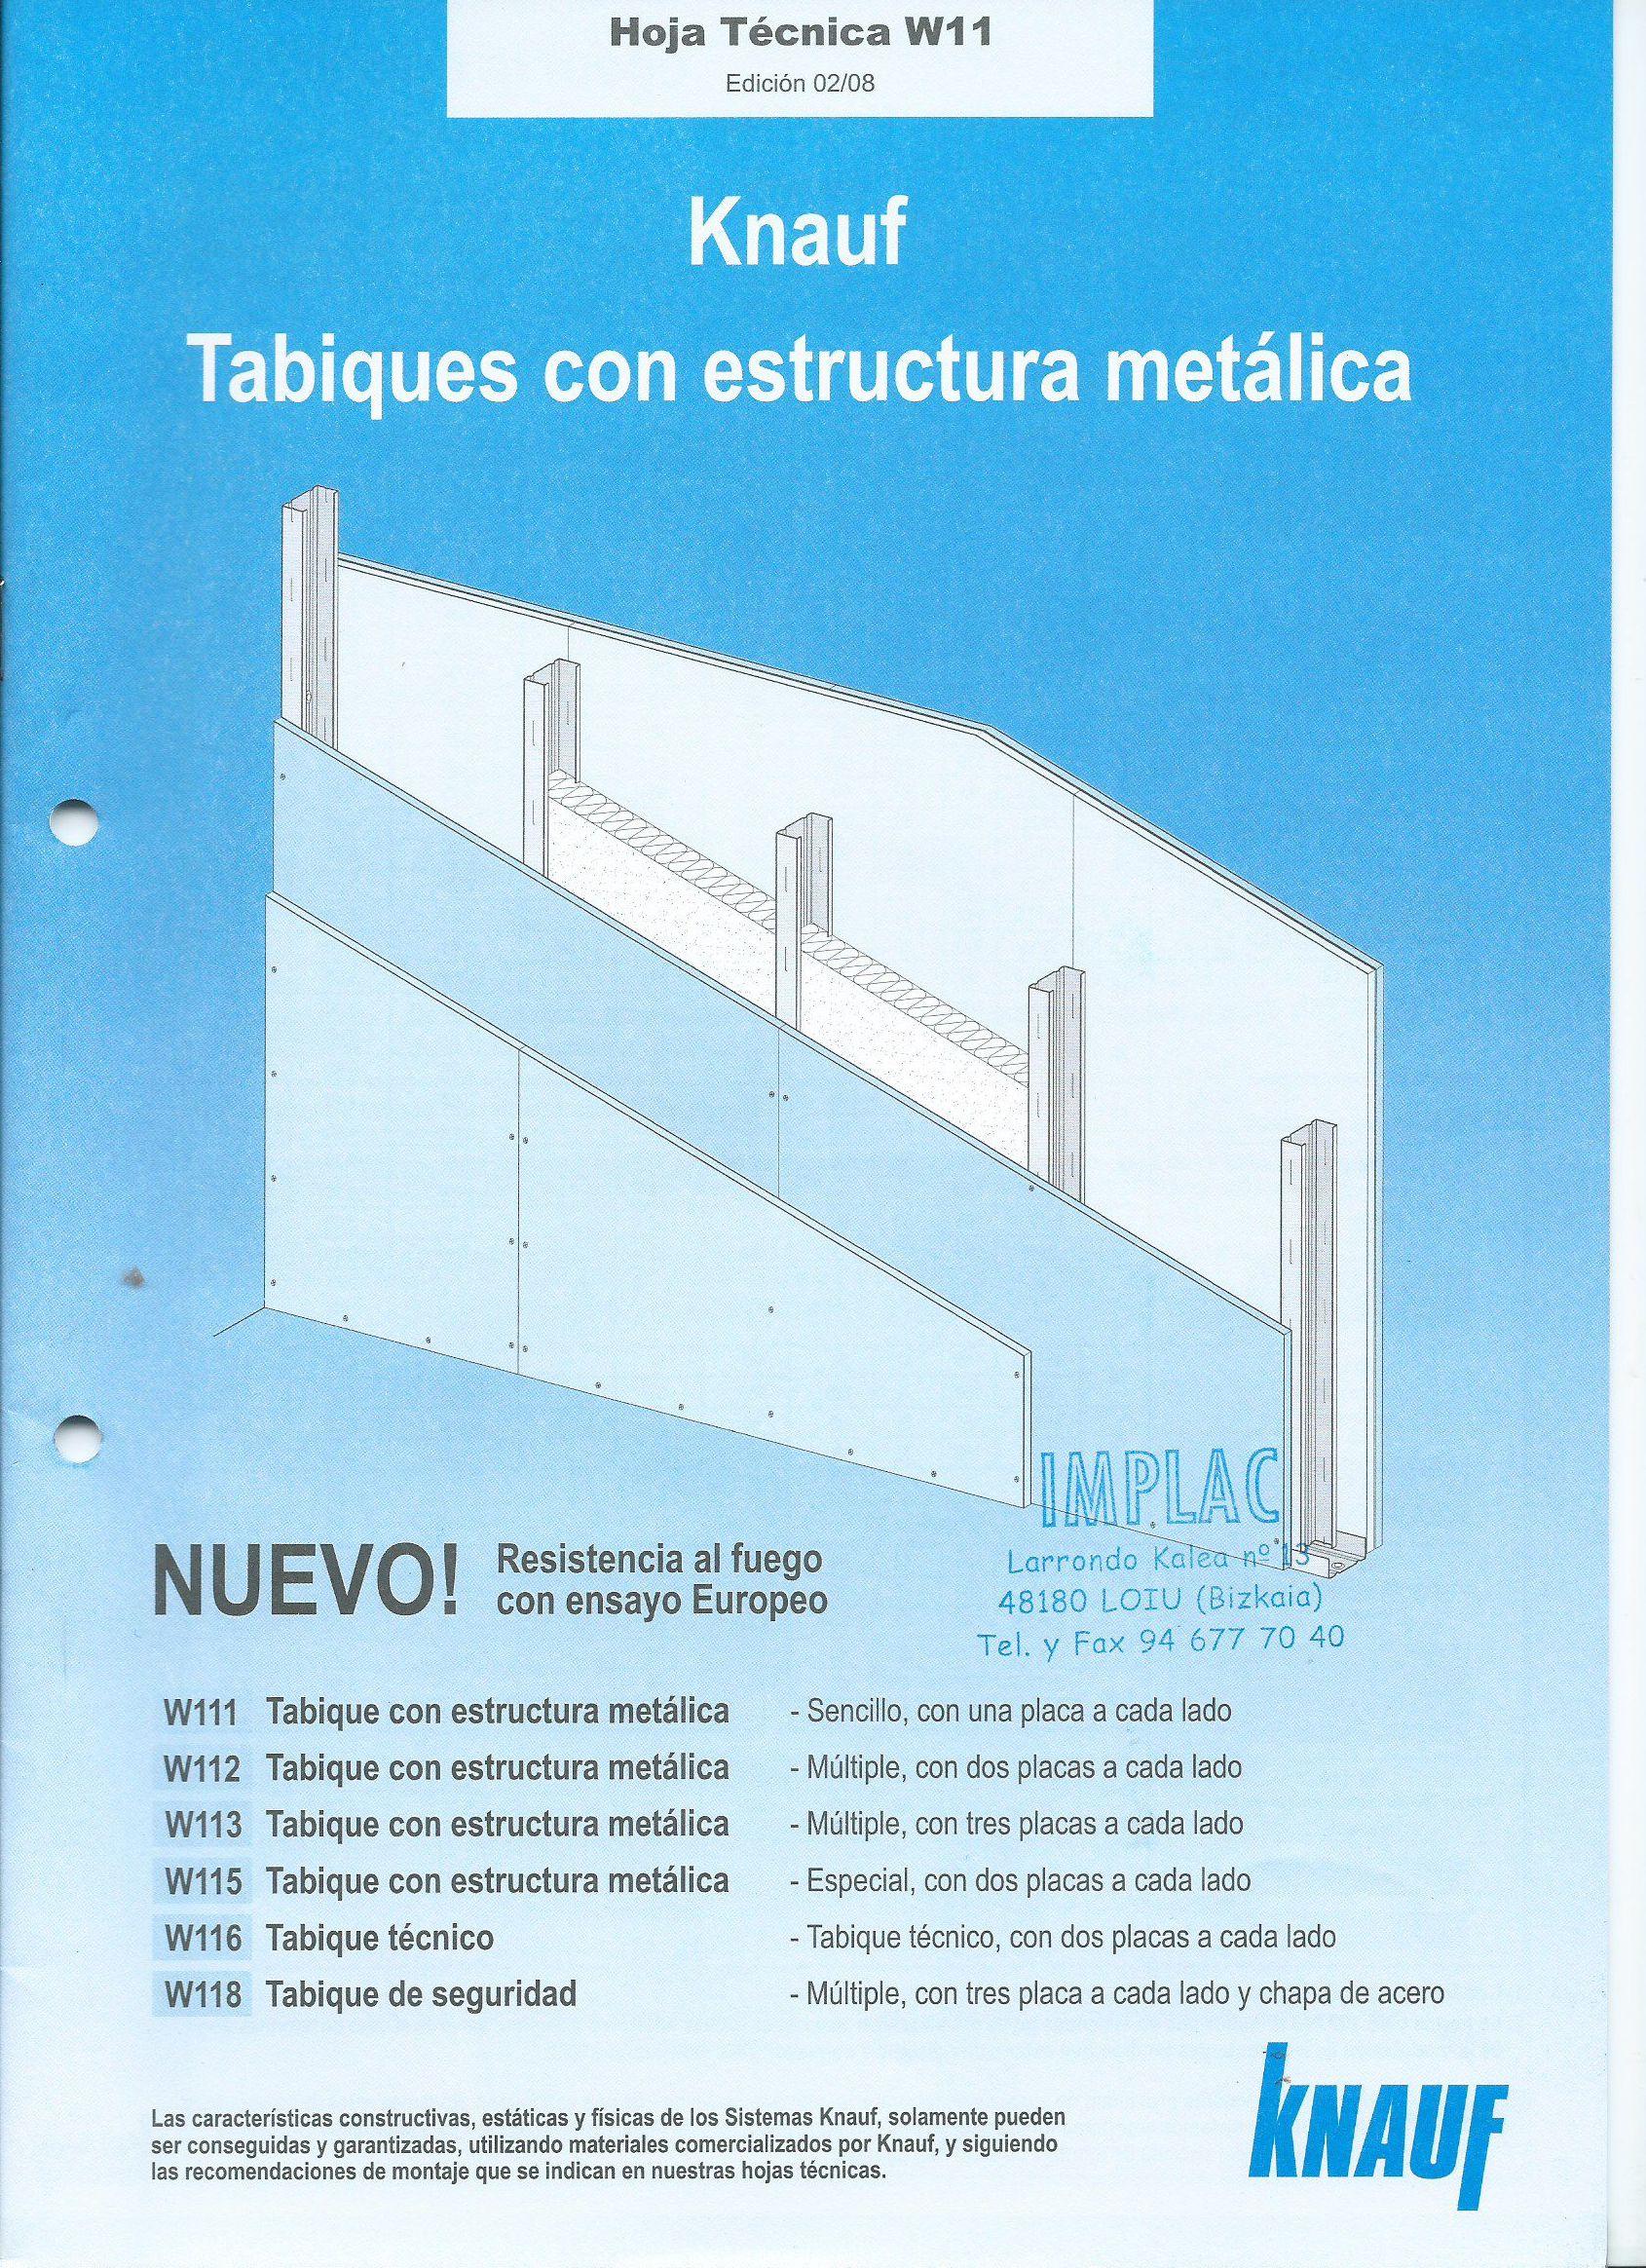 Tabiques con estructura metálica Knauf